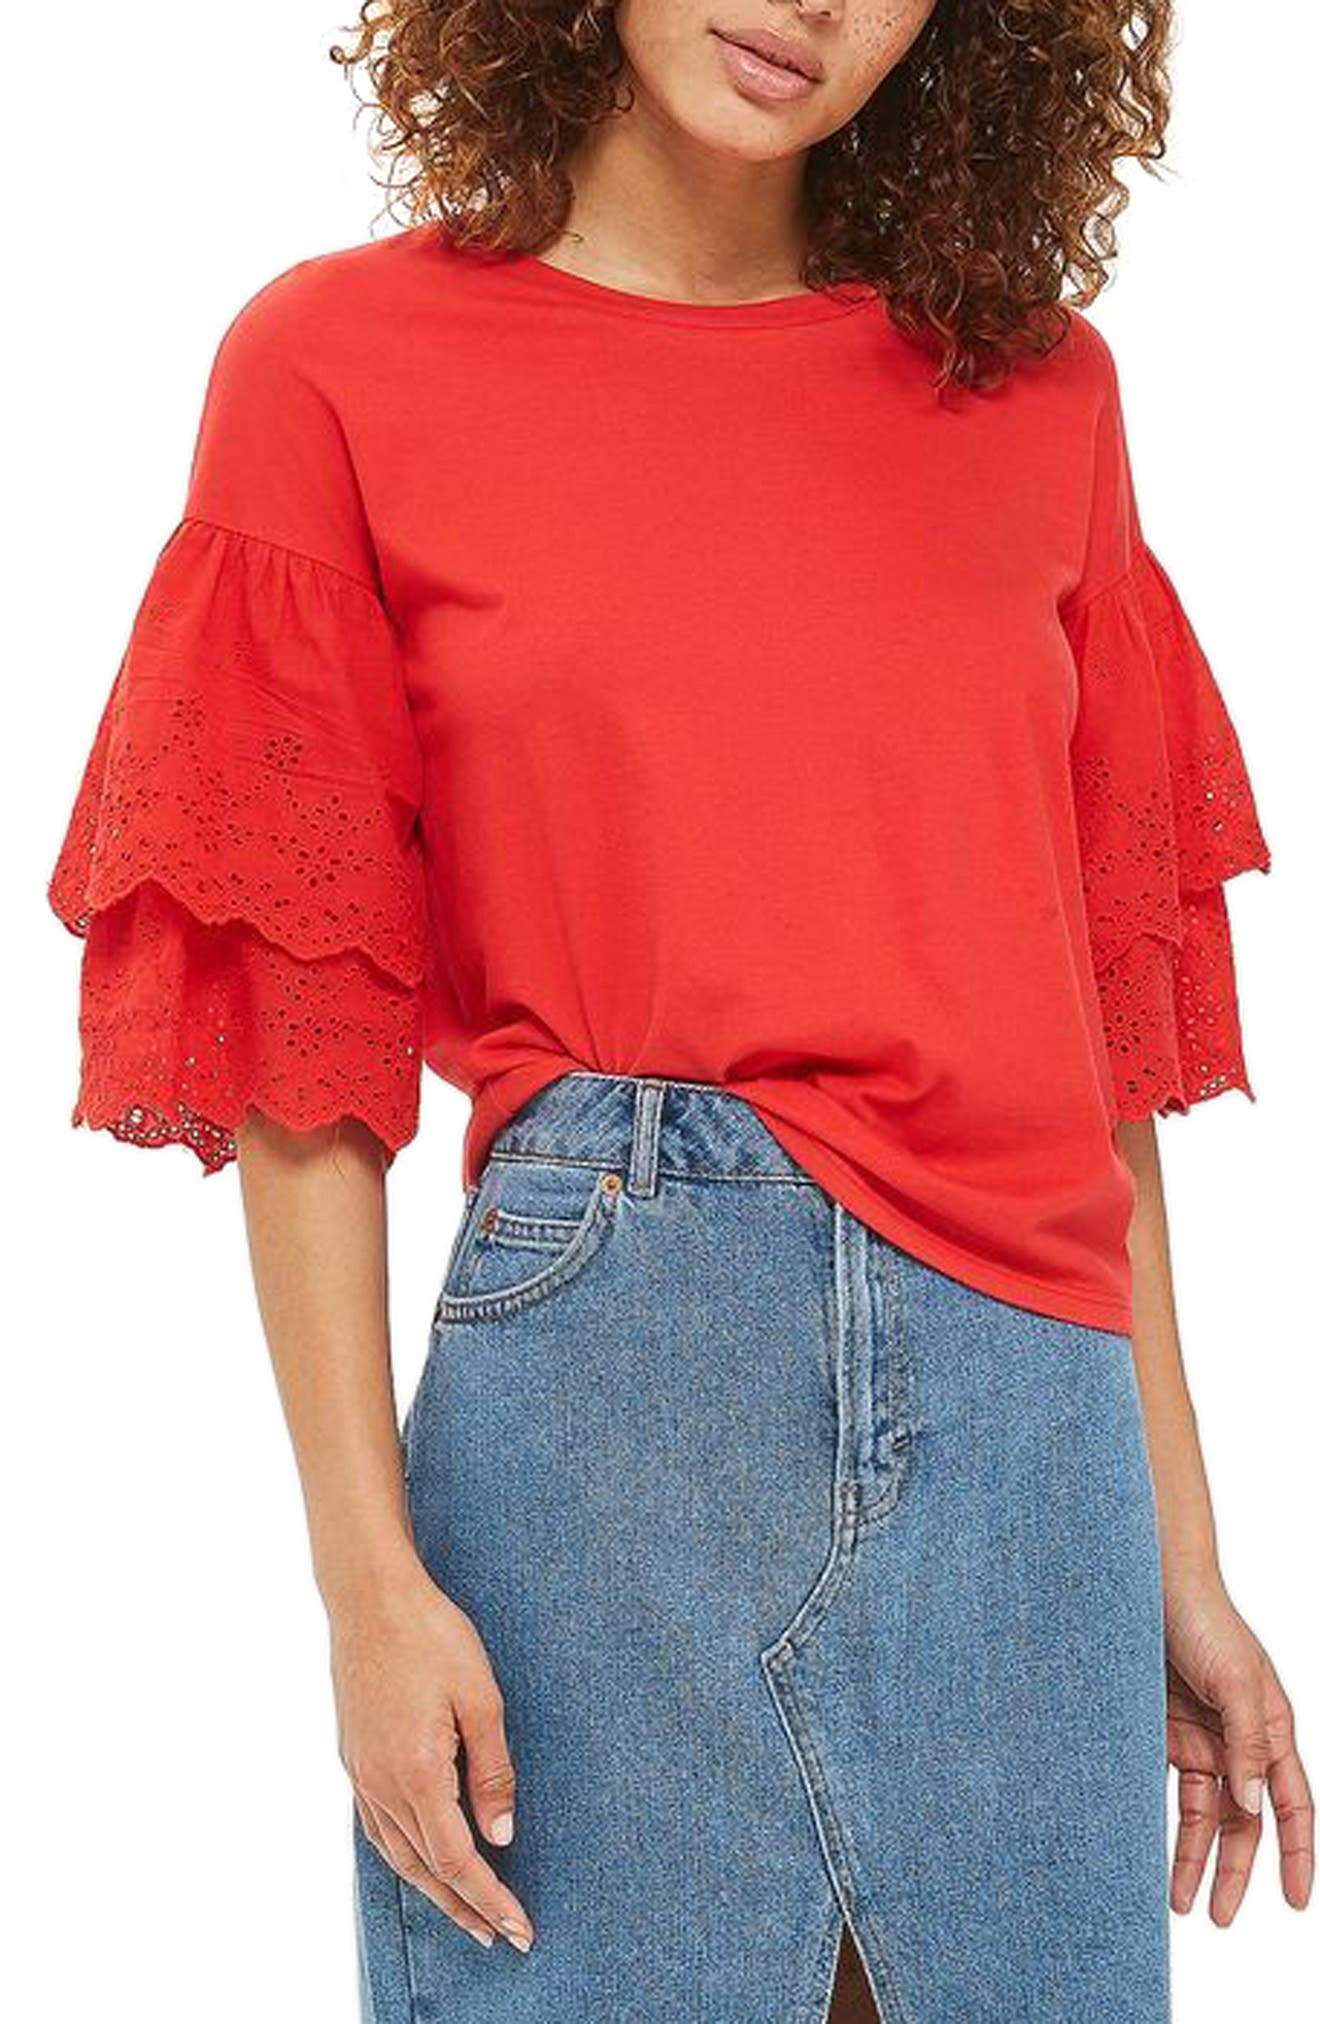 Main Image - Topshop Eyelet Layer Sleeve Tee T-Shirt (Regular & Petite)